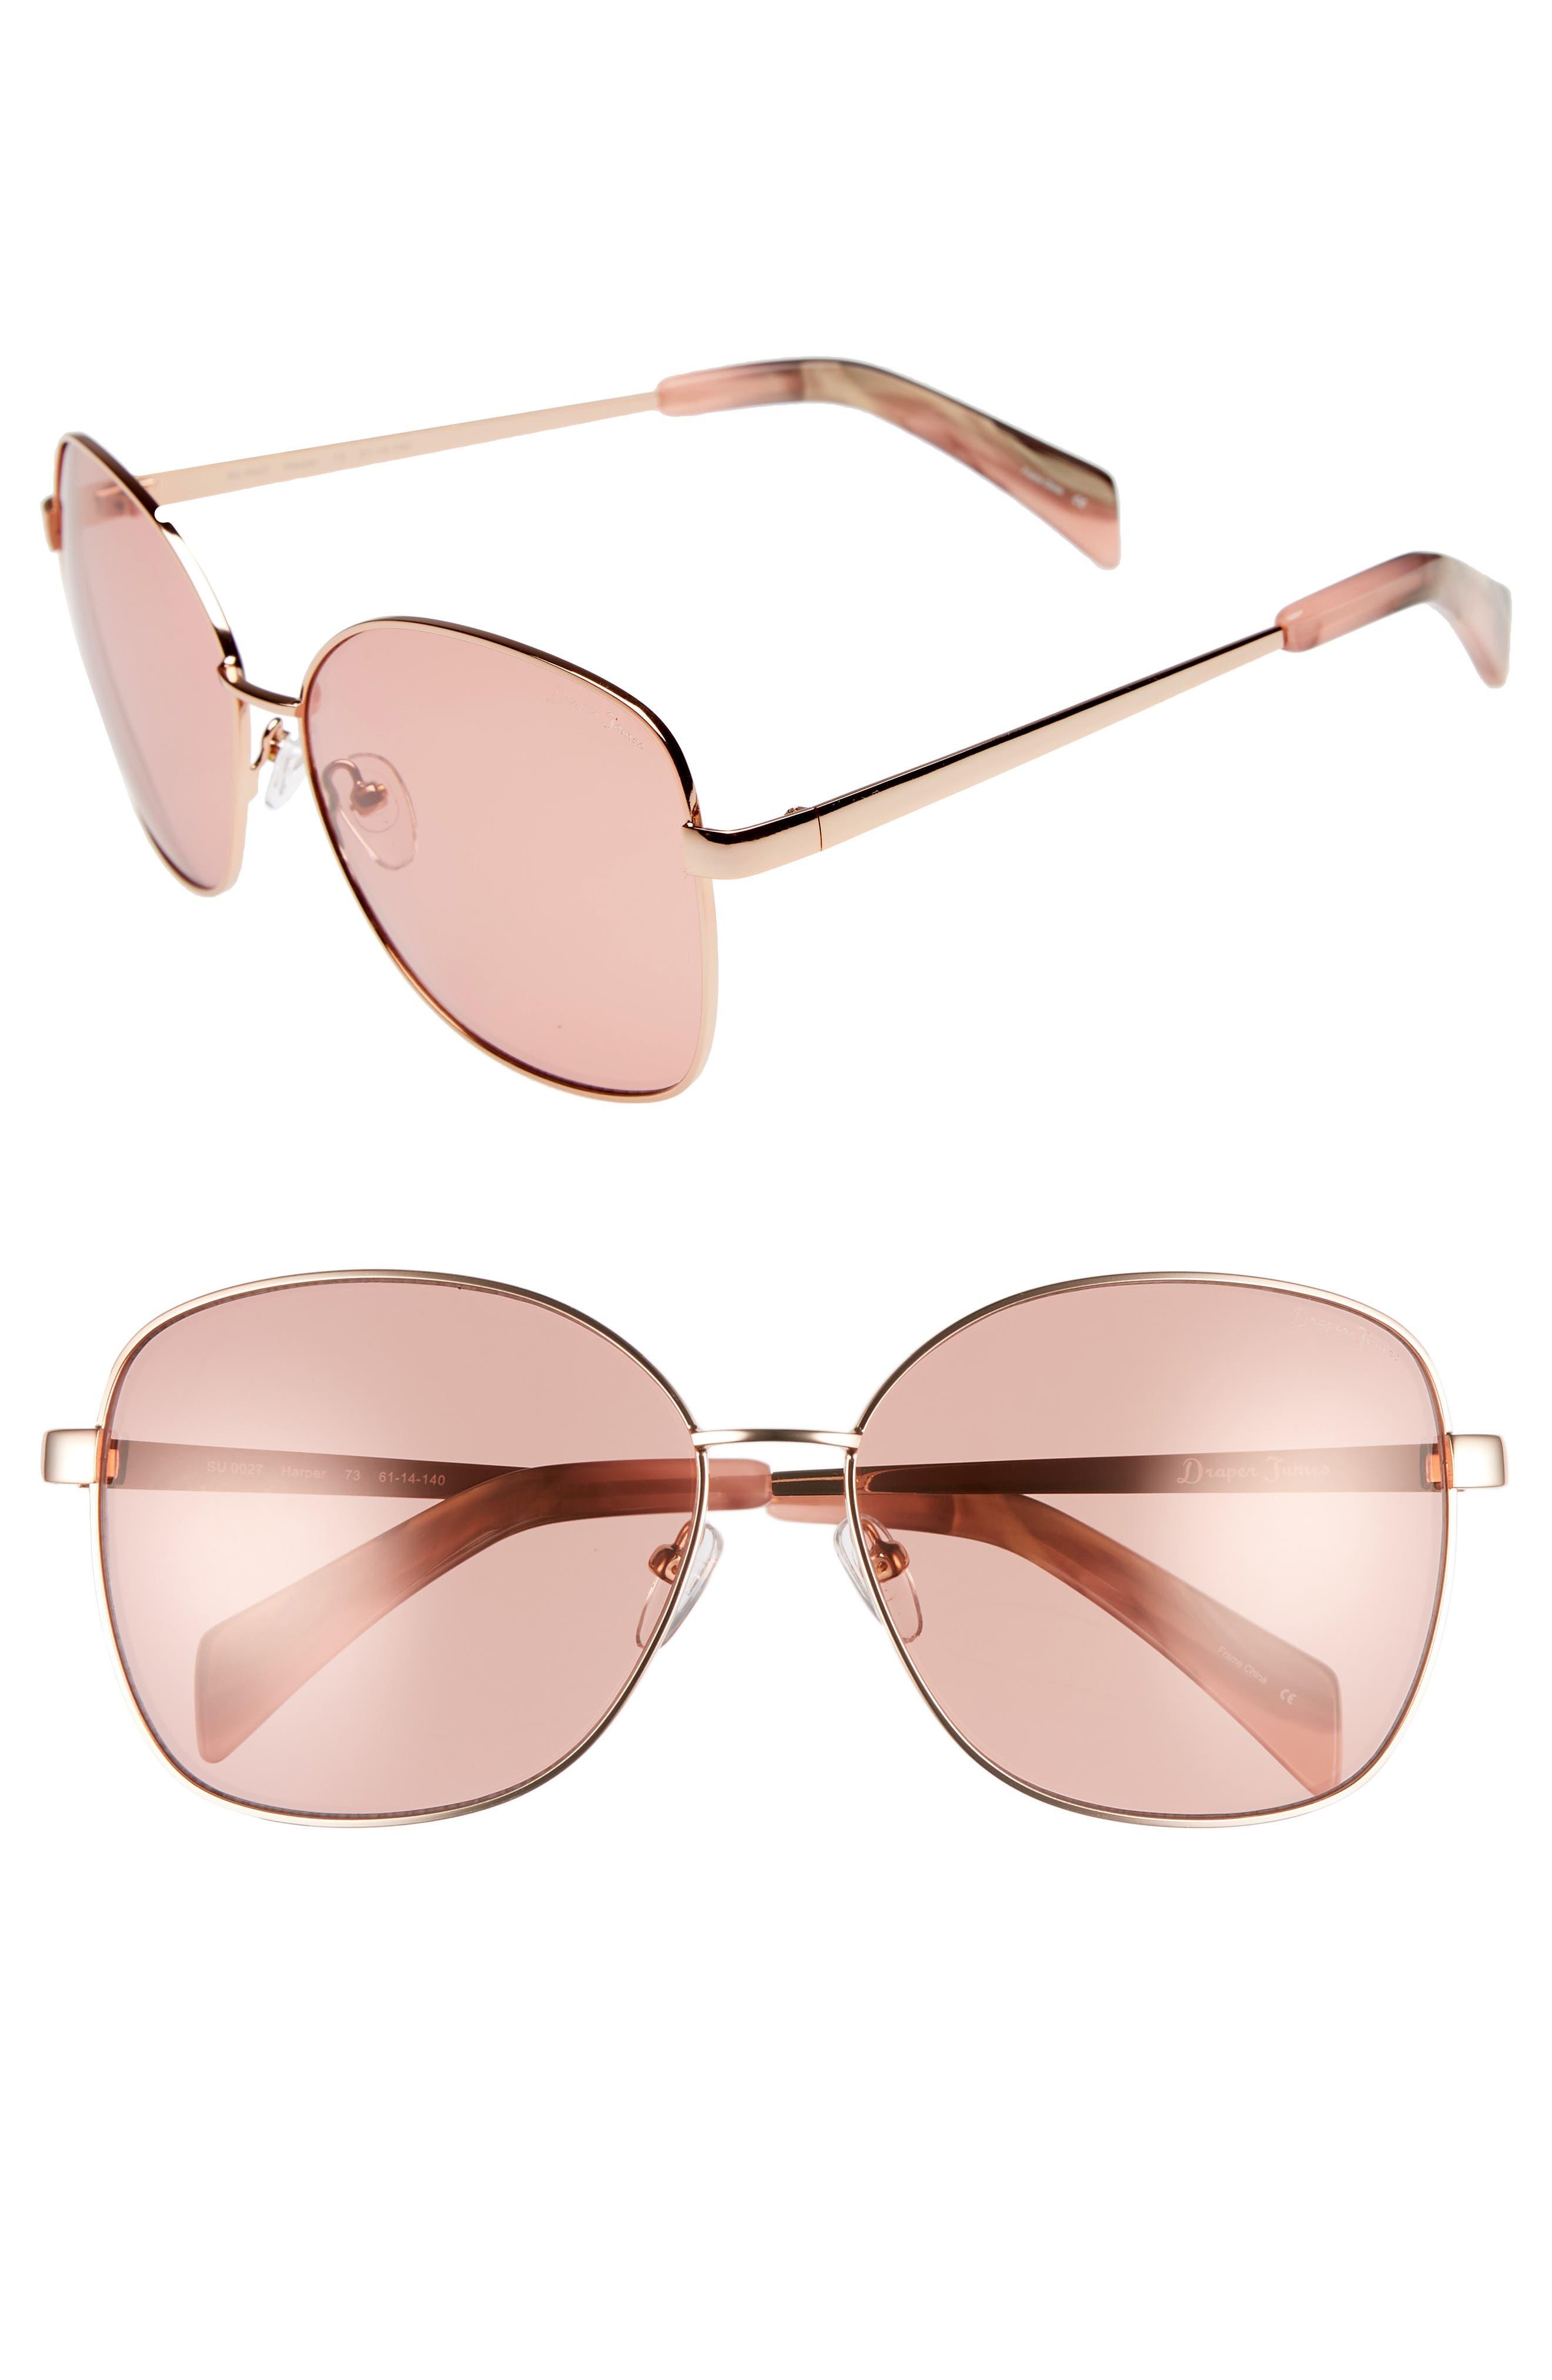 61mm Square Sunglasses,                             Main thumbnail 1, color,                             ROSE GOLD